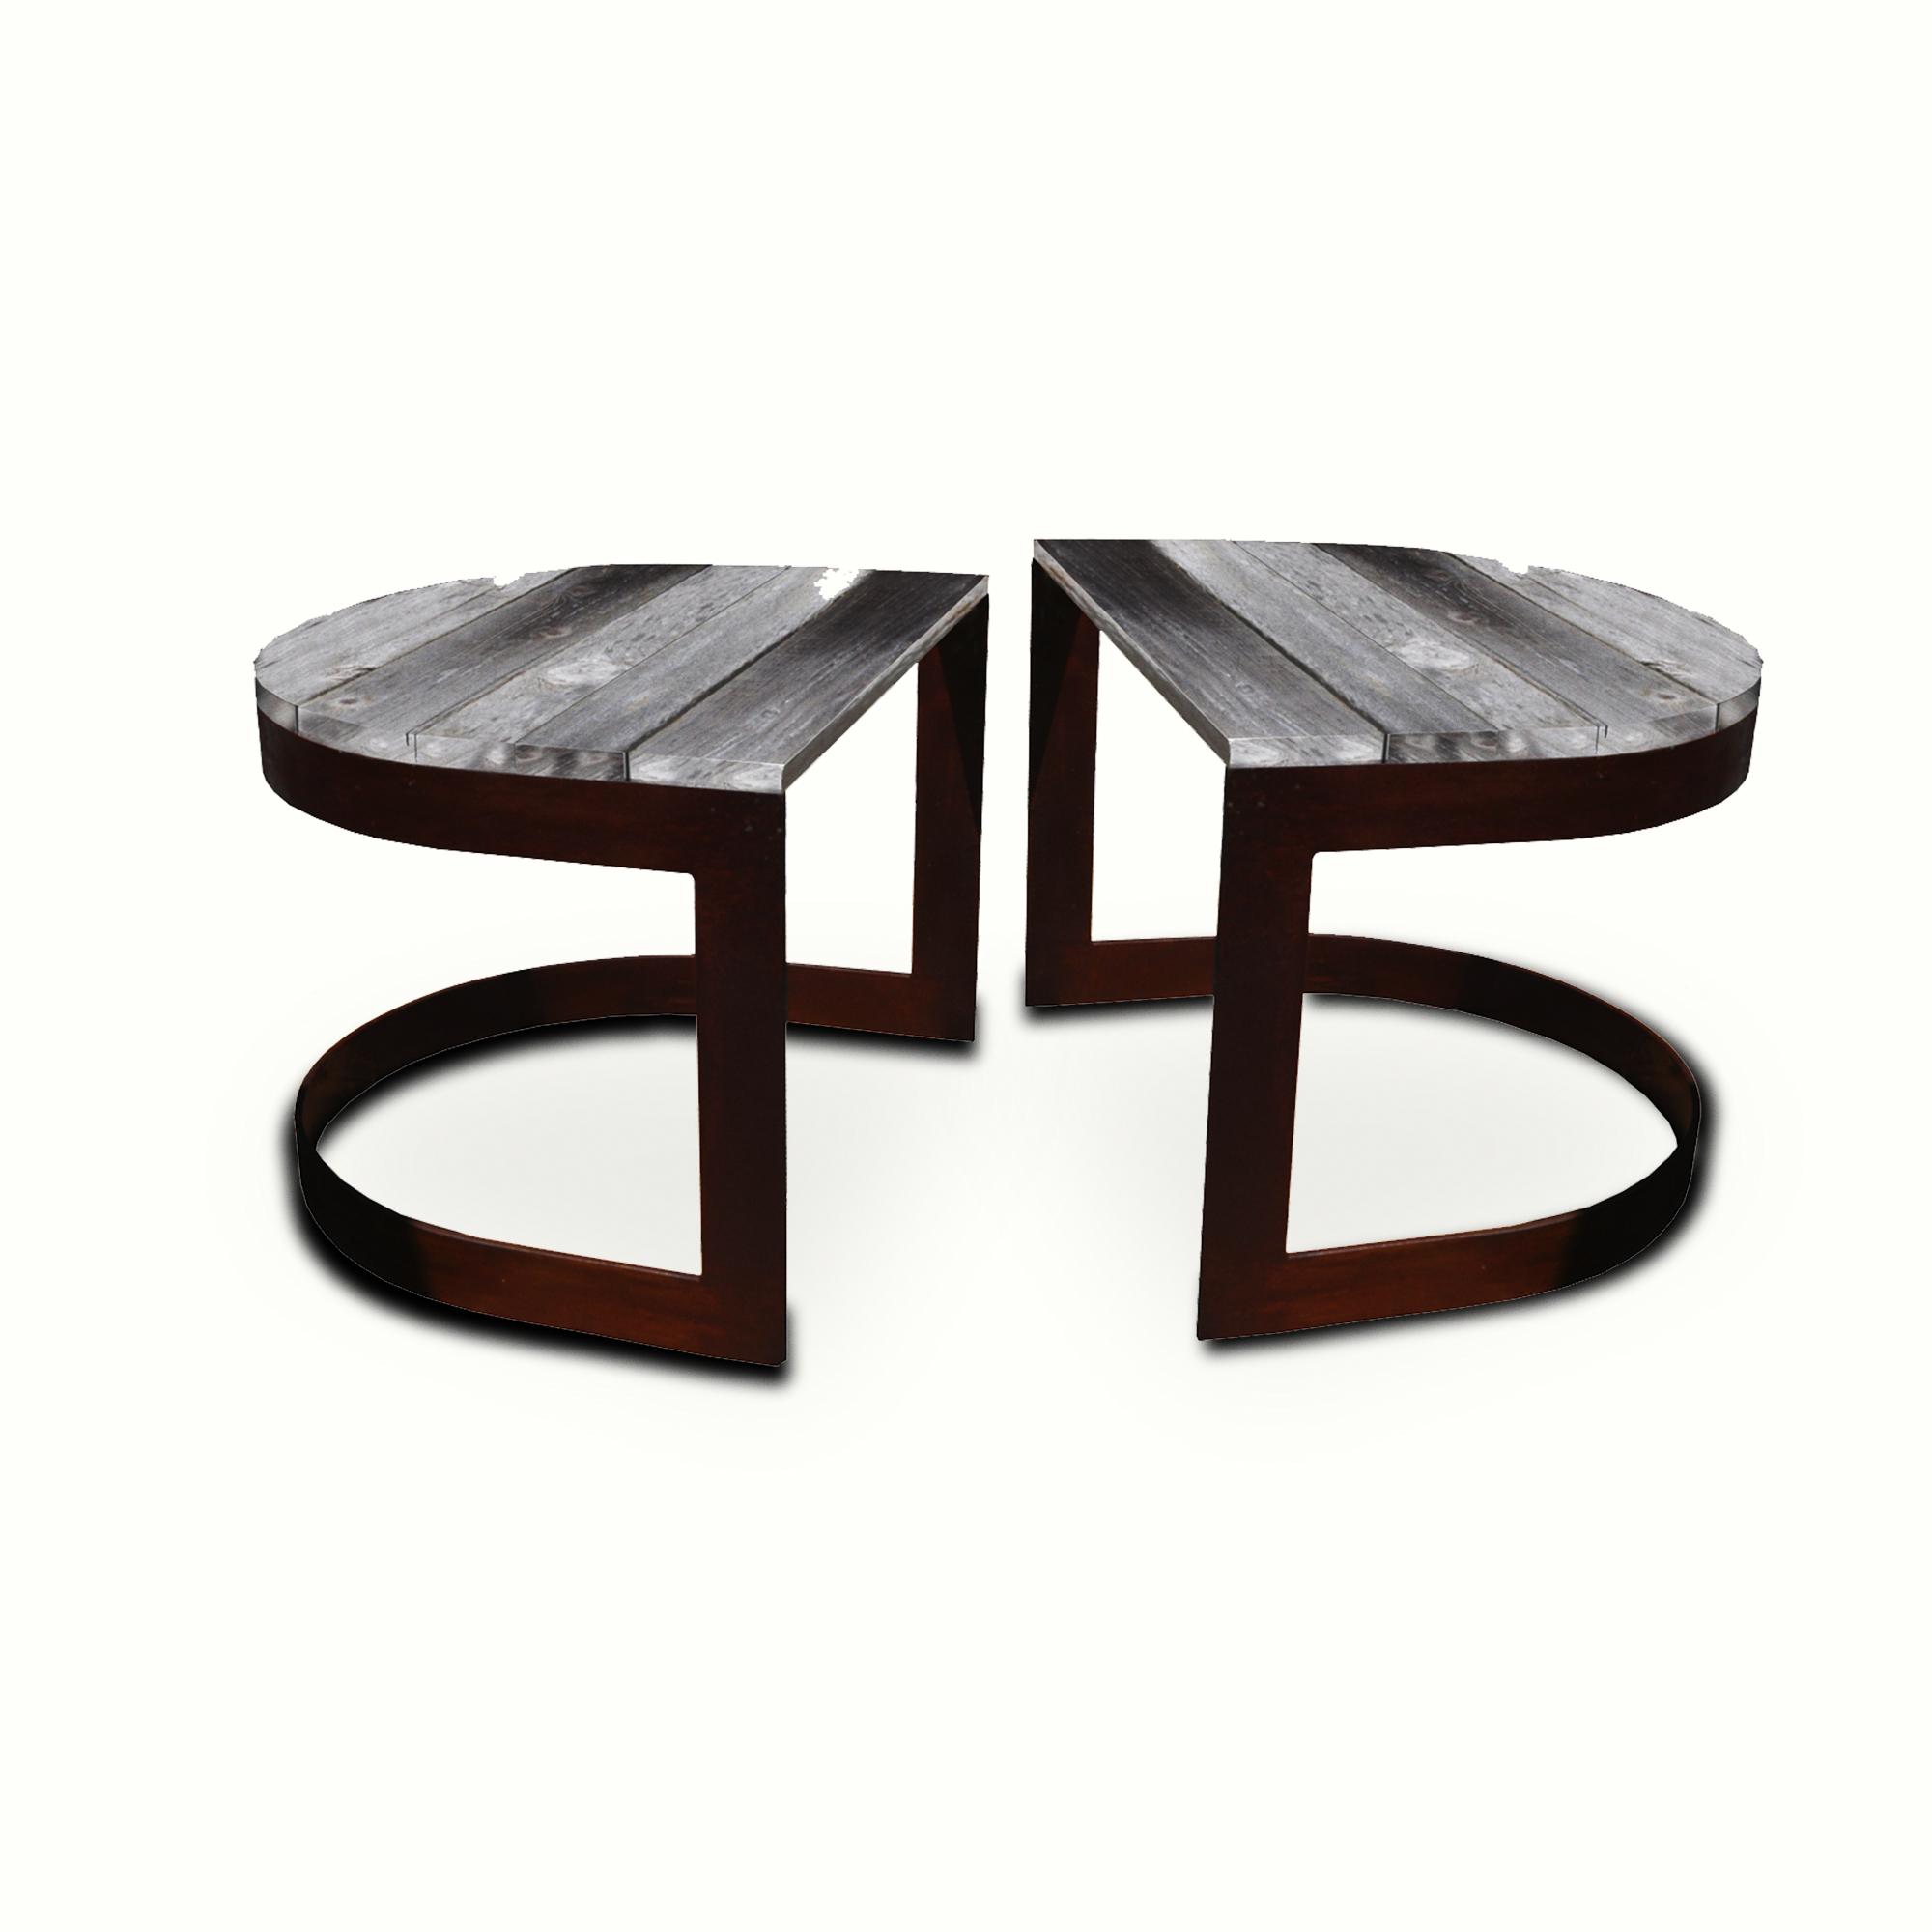 10010-irwo-ta Reclaimed Wood U-shaped Side Table Pair – ADG Lighting Collection